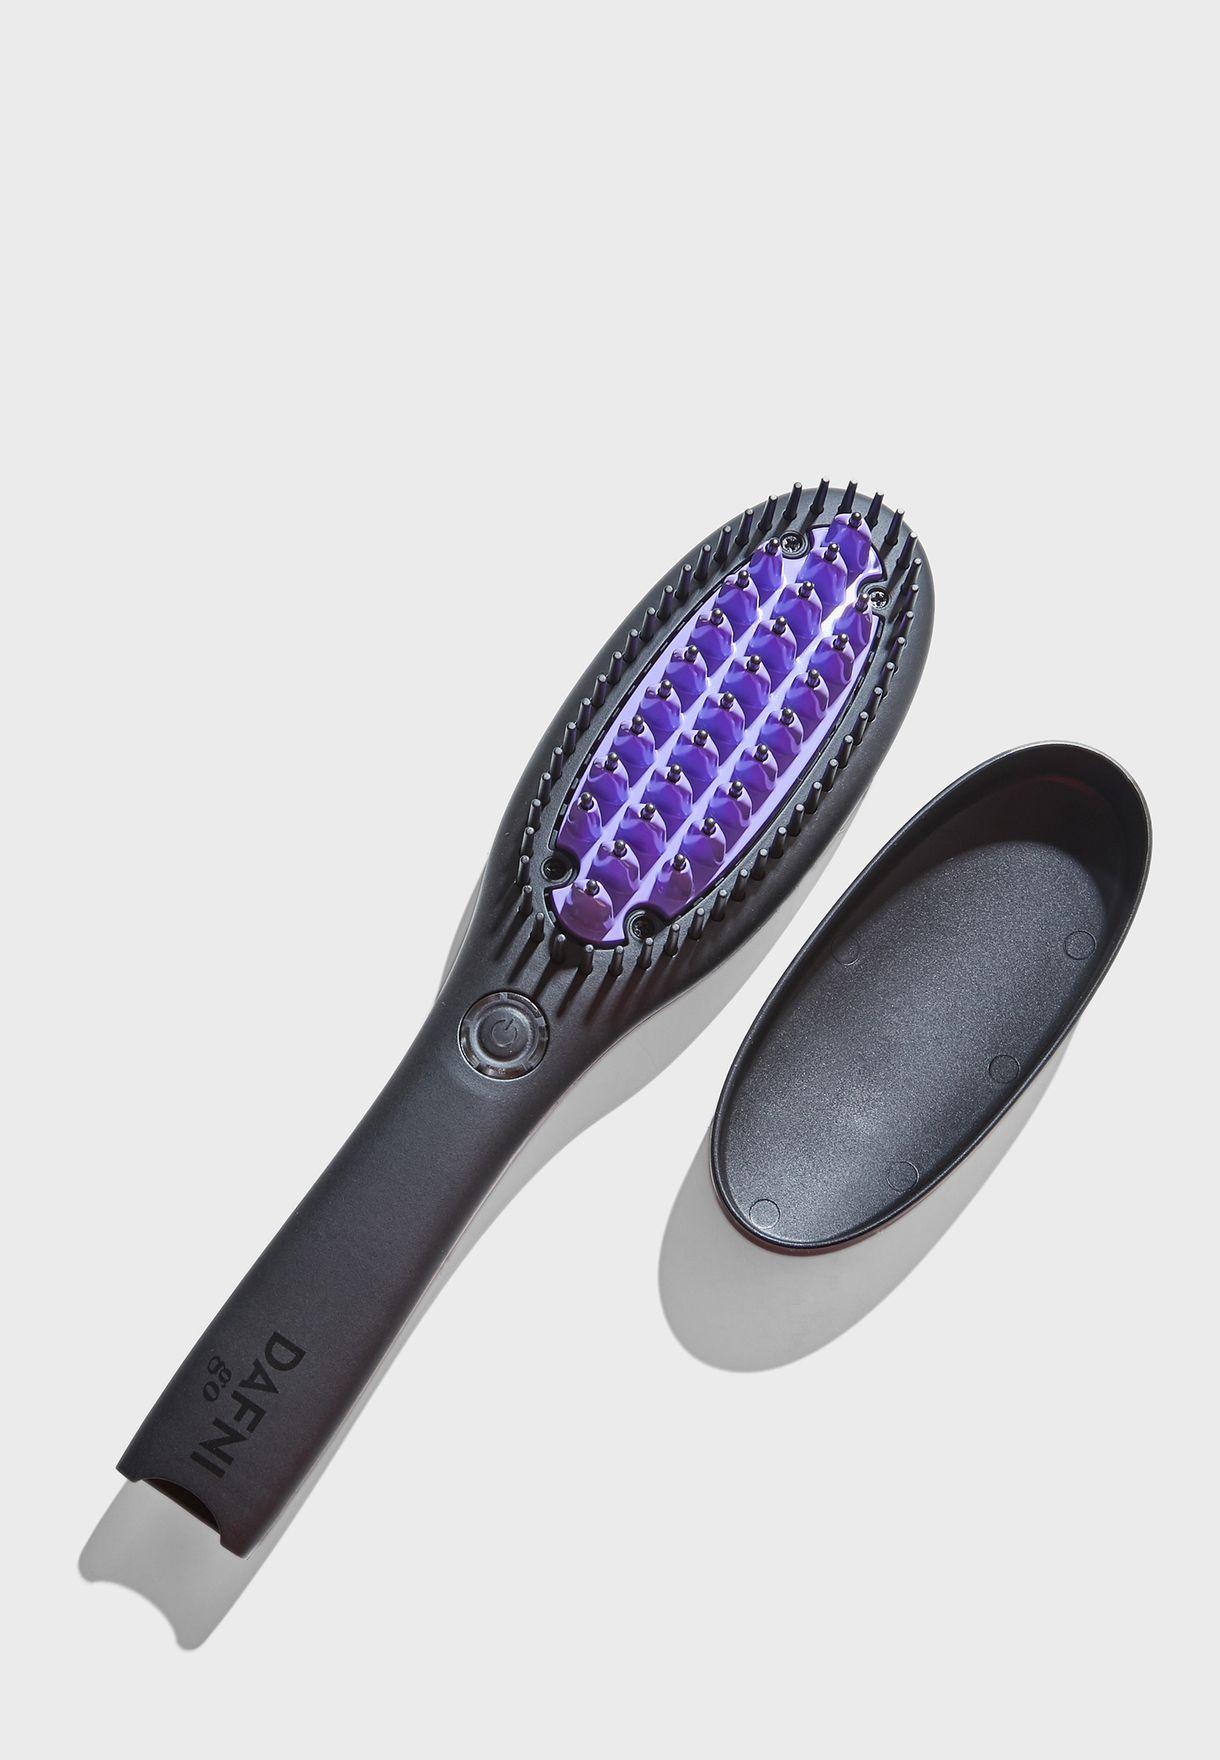 Shop Dafni Black Dafni Go Hair Straightening Brush Go Hair